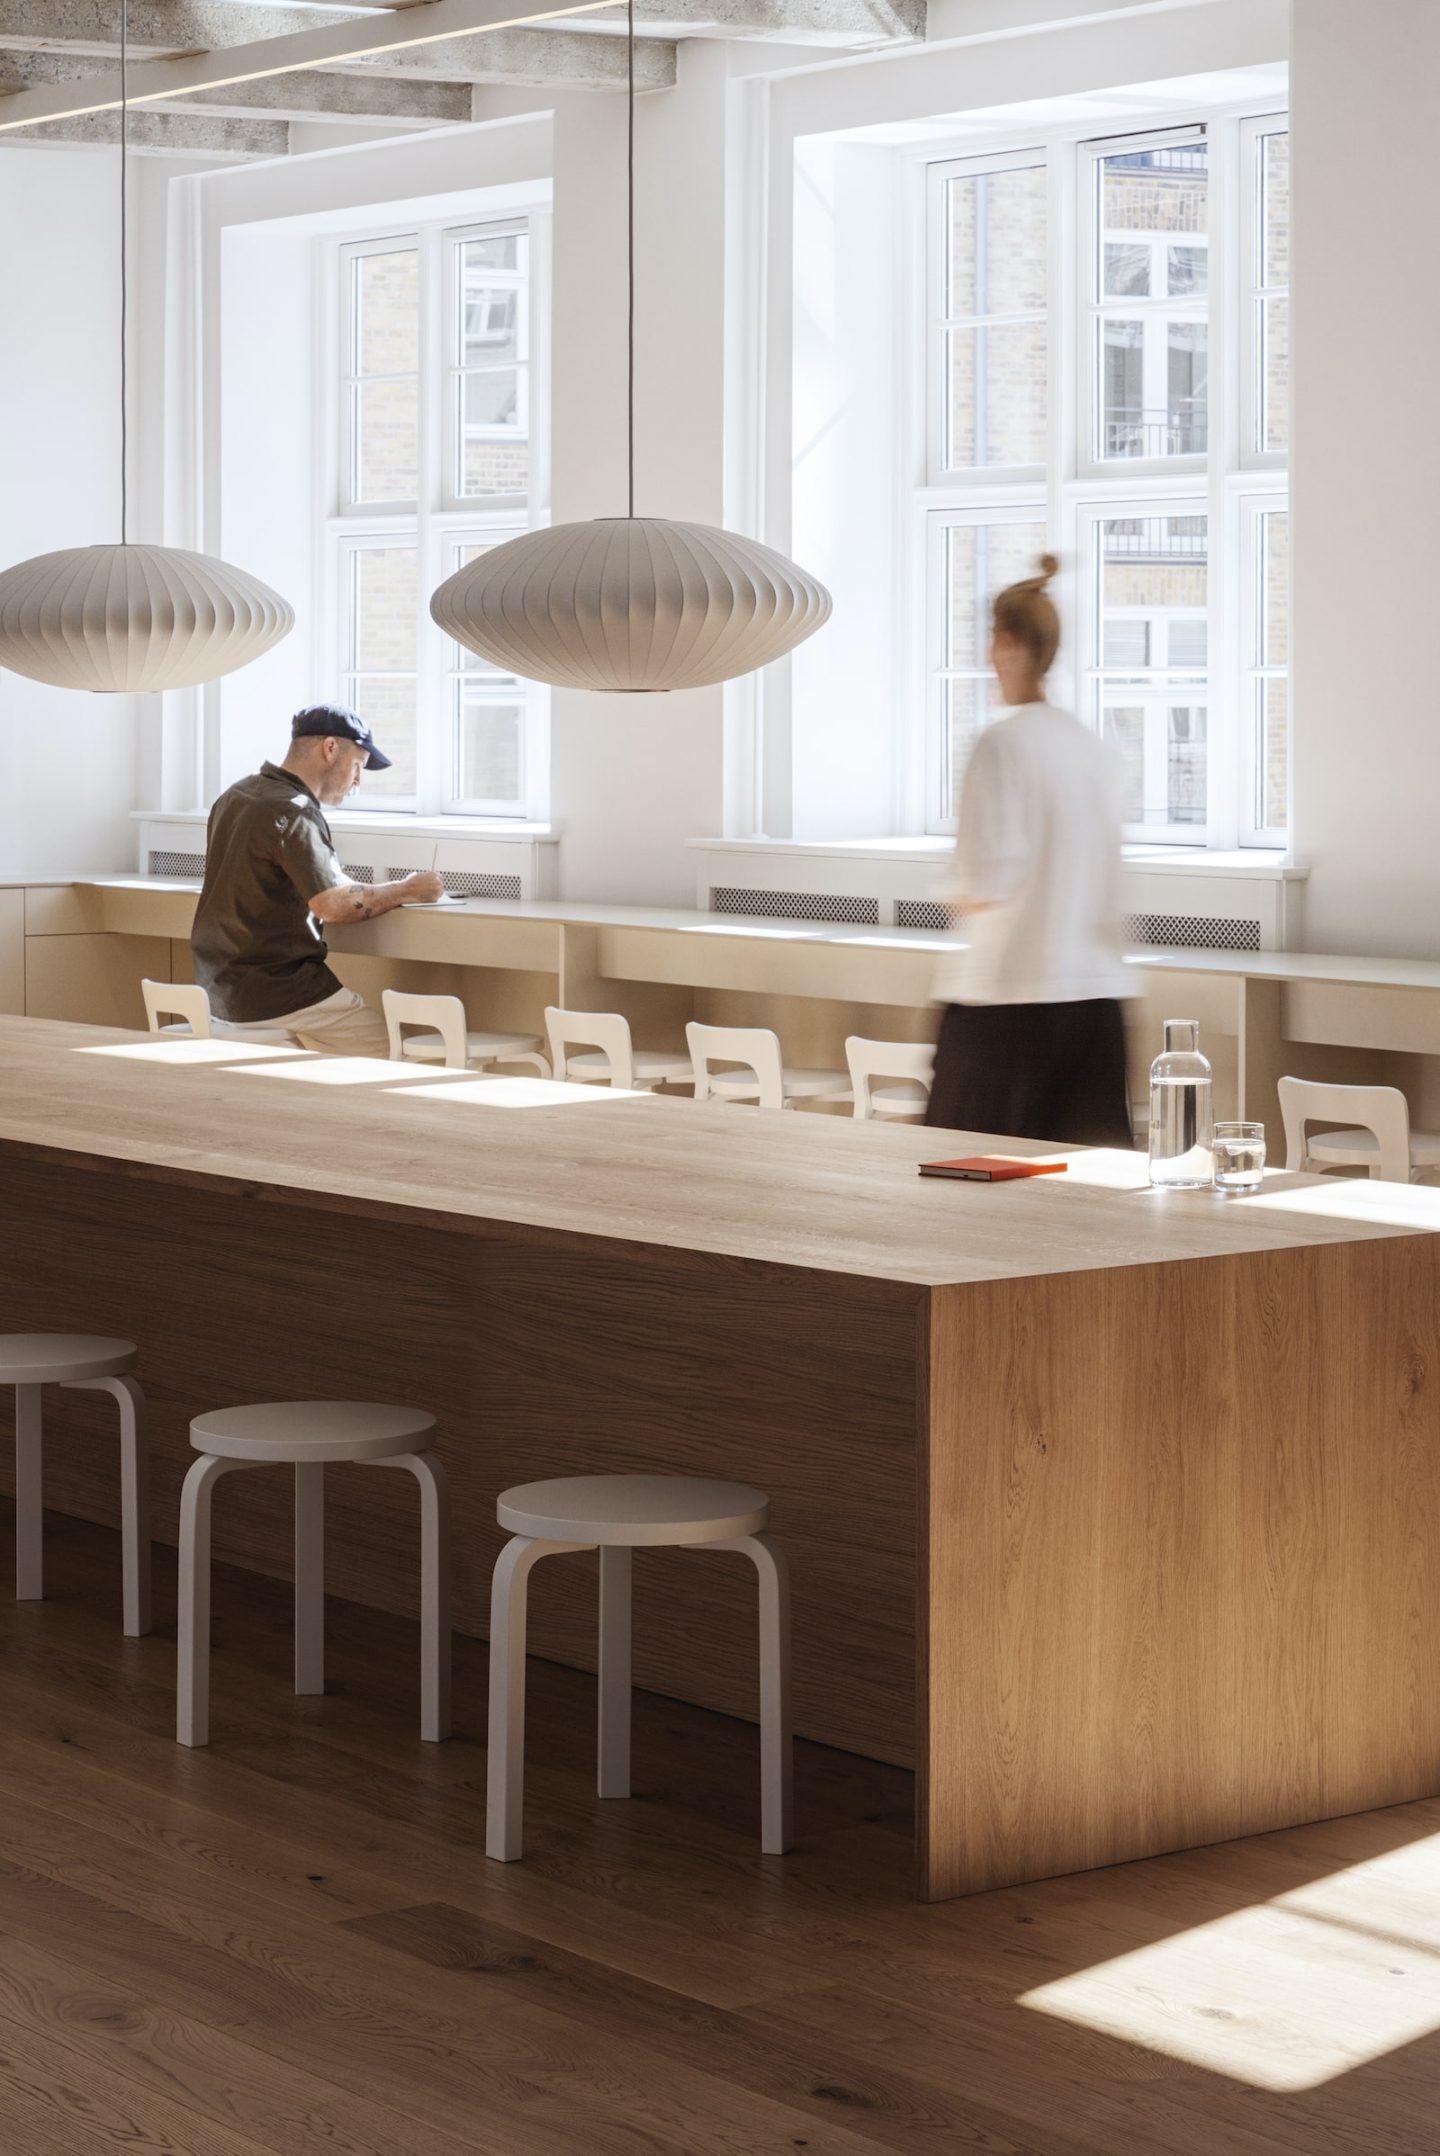 IGNANT-Design-Aspekt-Office-015